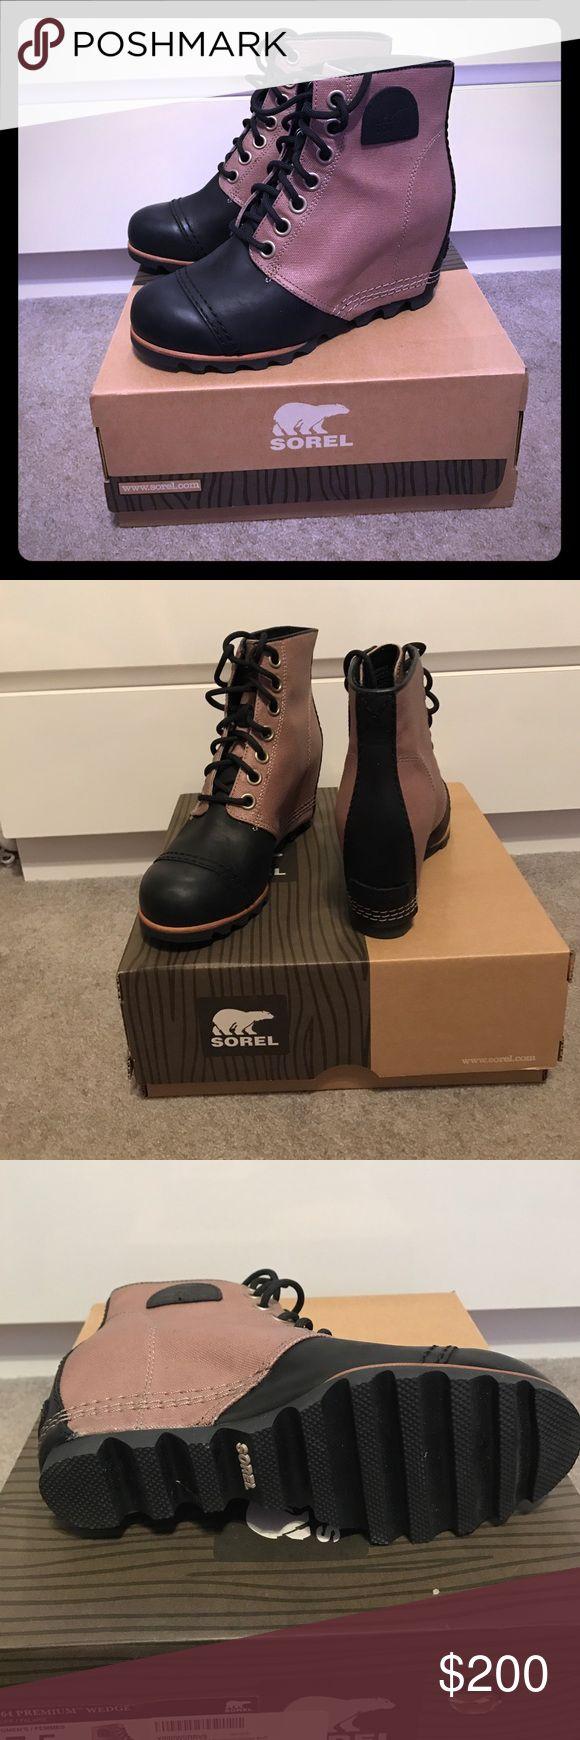 Sorel 1964 Premium Wedge Bluff winter snow boot 7.5. New in box Sorel Shoes Winter & Rain Boots